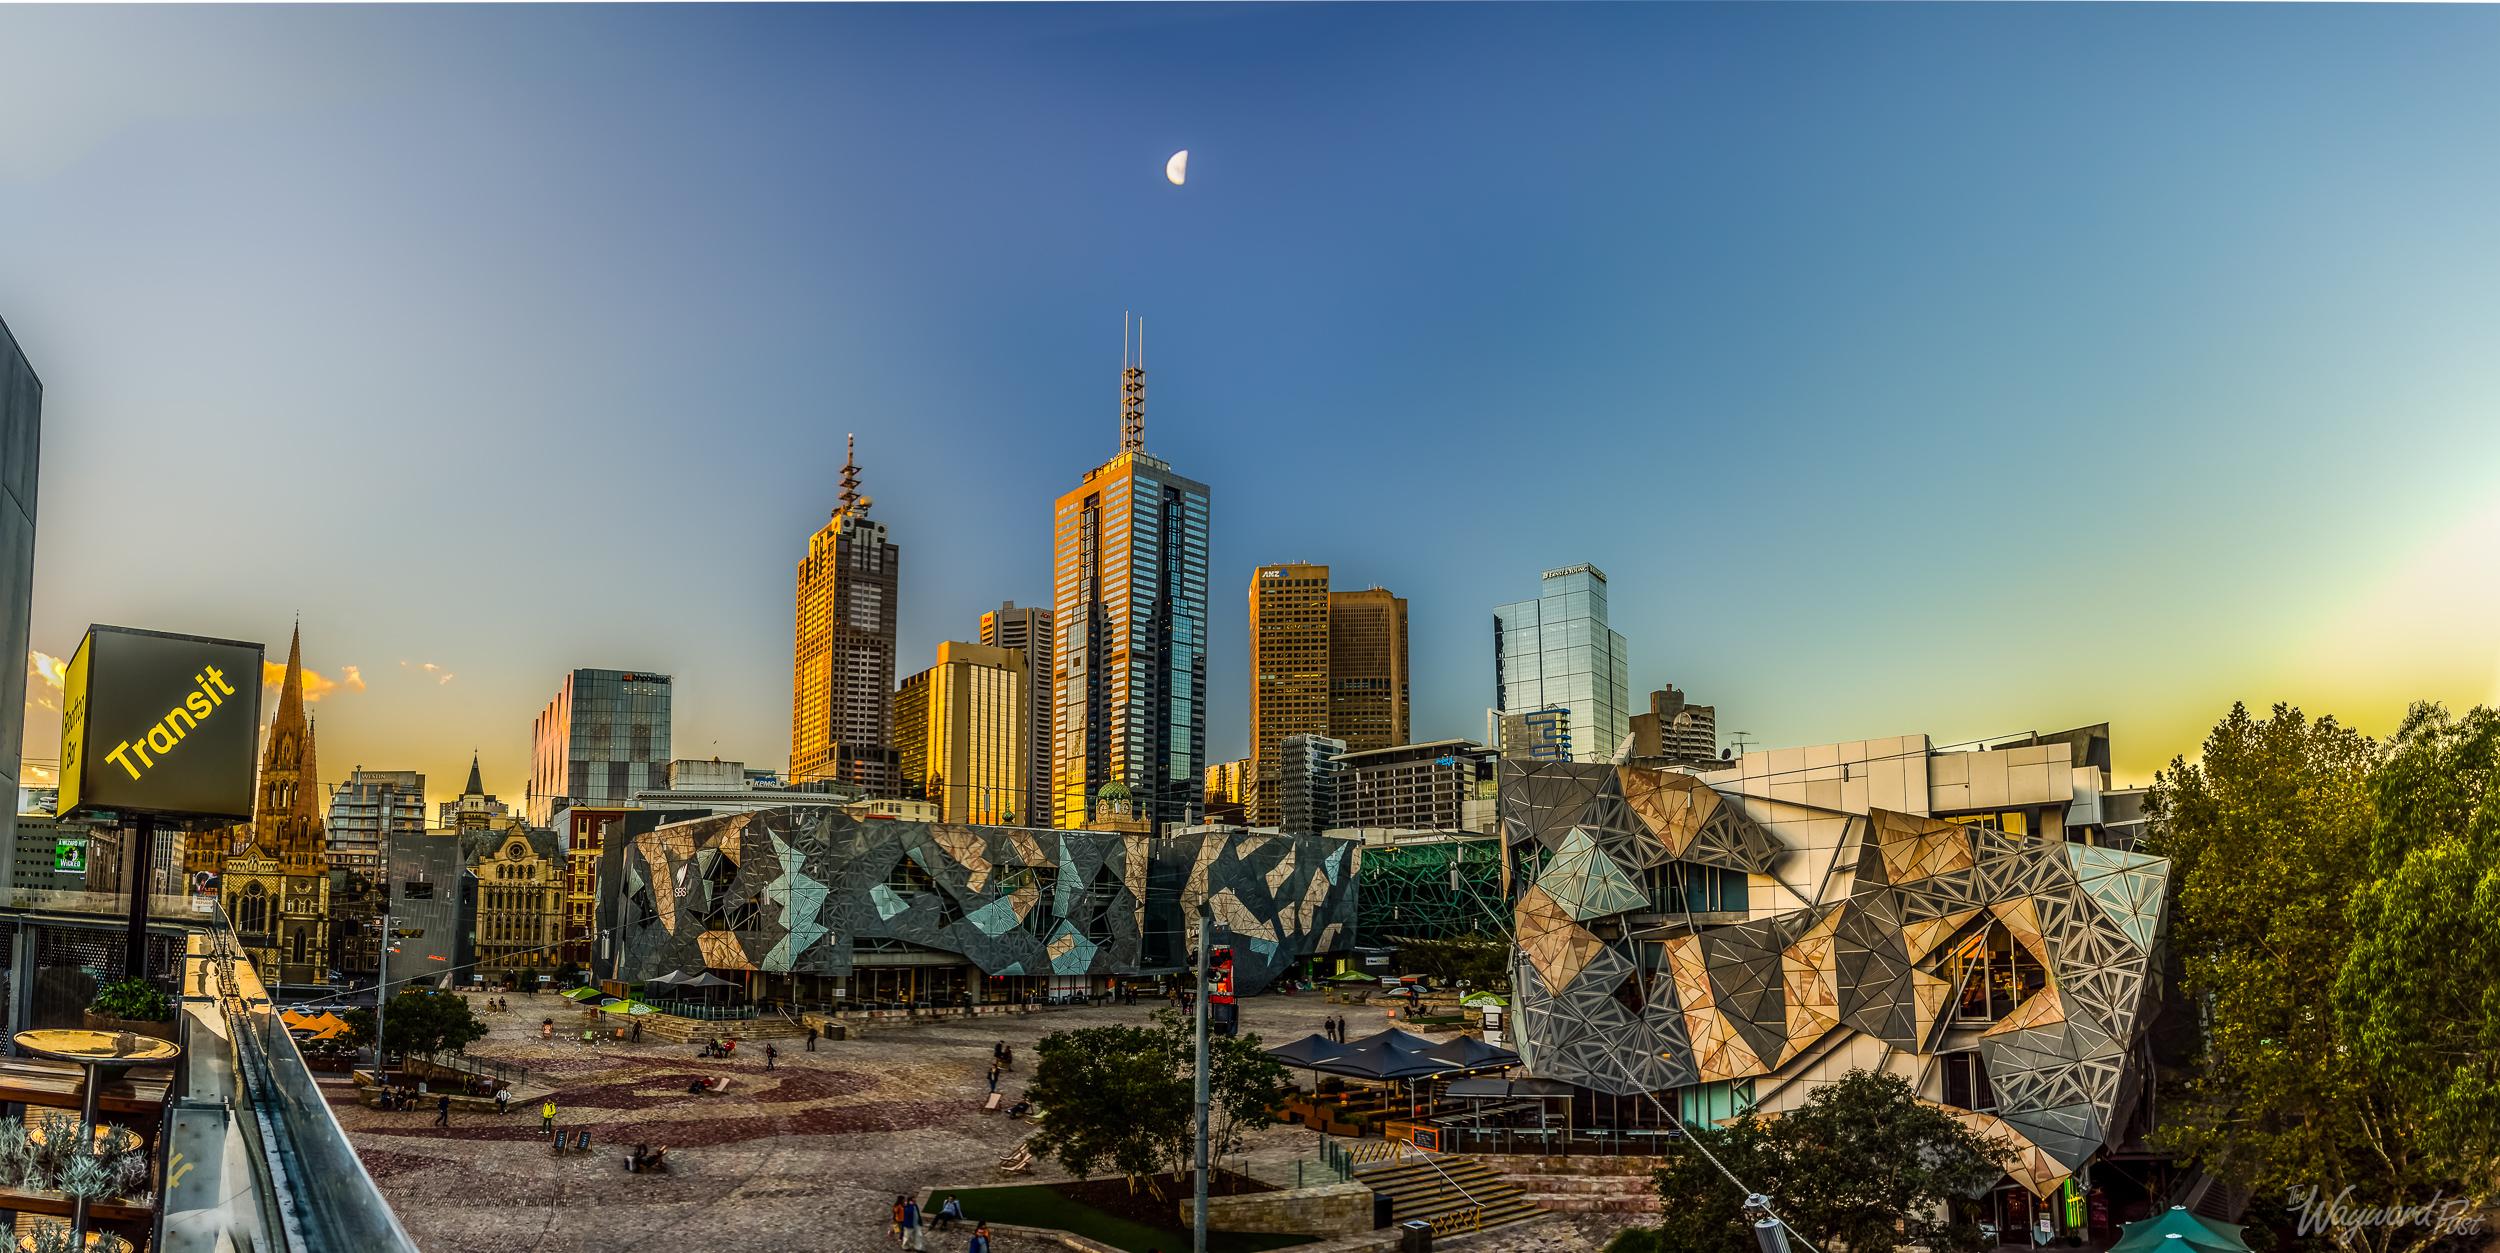 Melbourne Australia - Photo by Zygmunt Spray